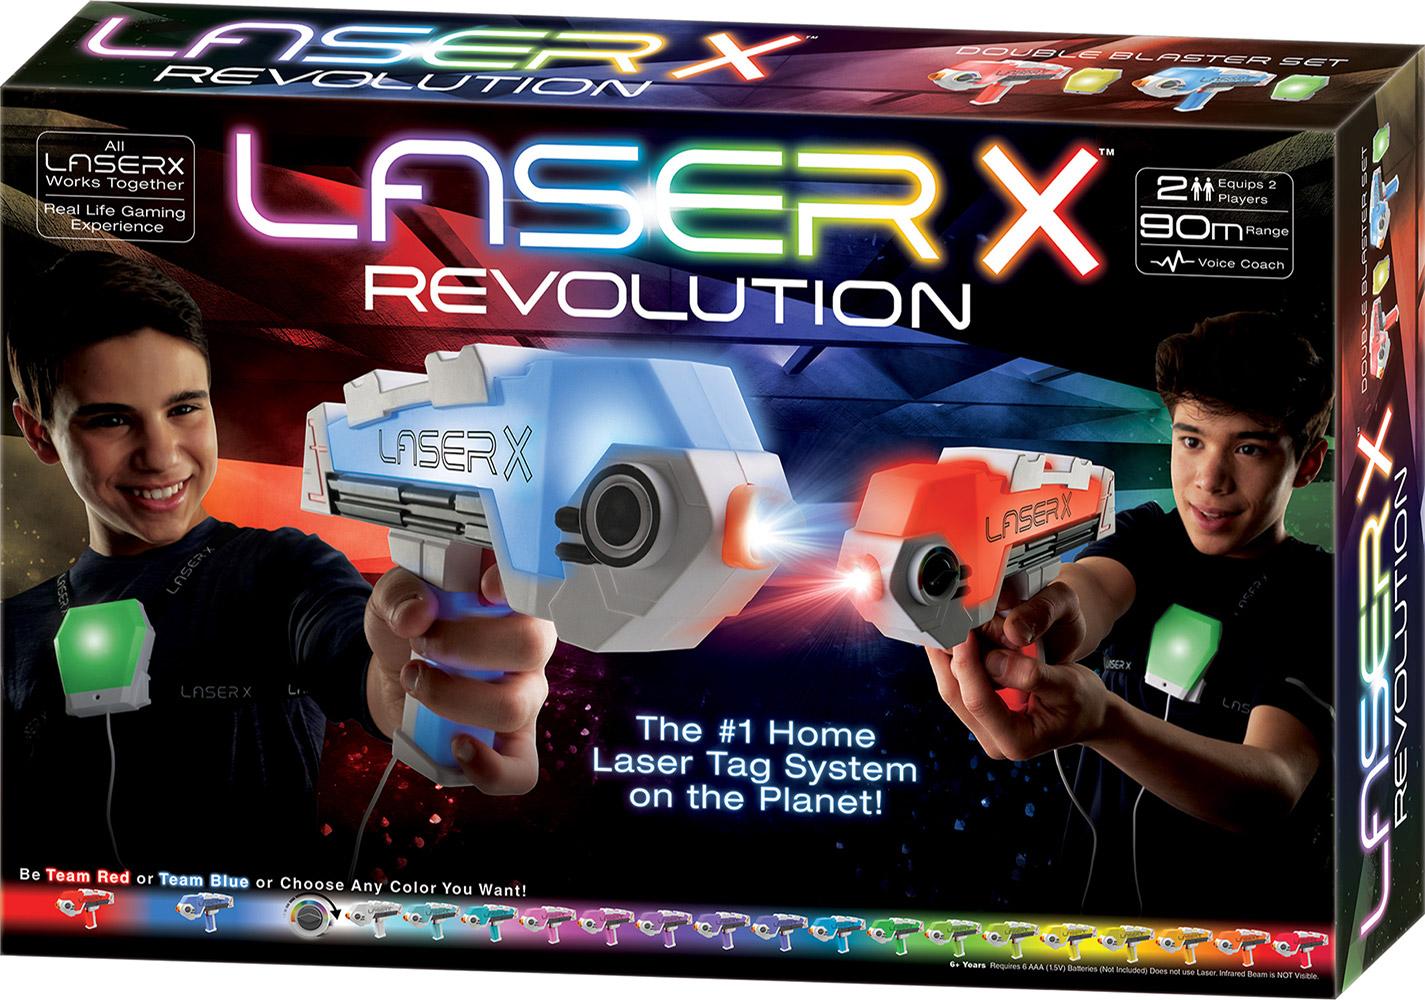 www.hunterleisure.com.au Laser X Revolution Big W Toys R Us Hunter Leisure